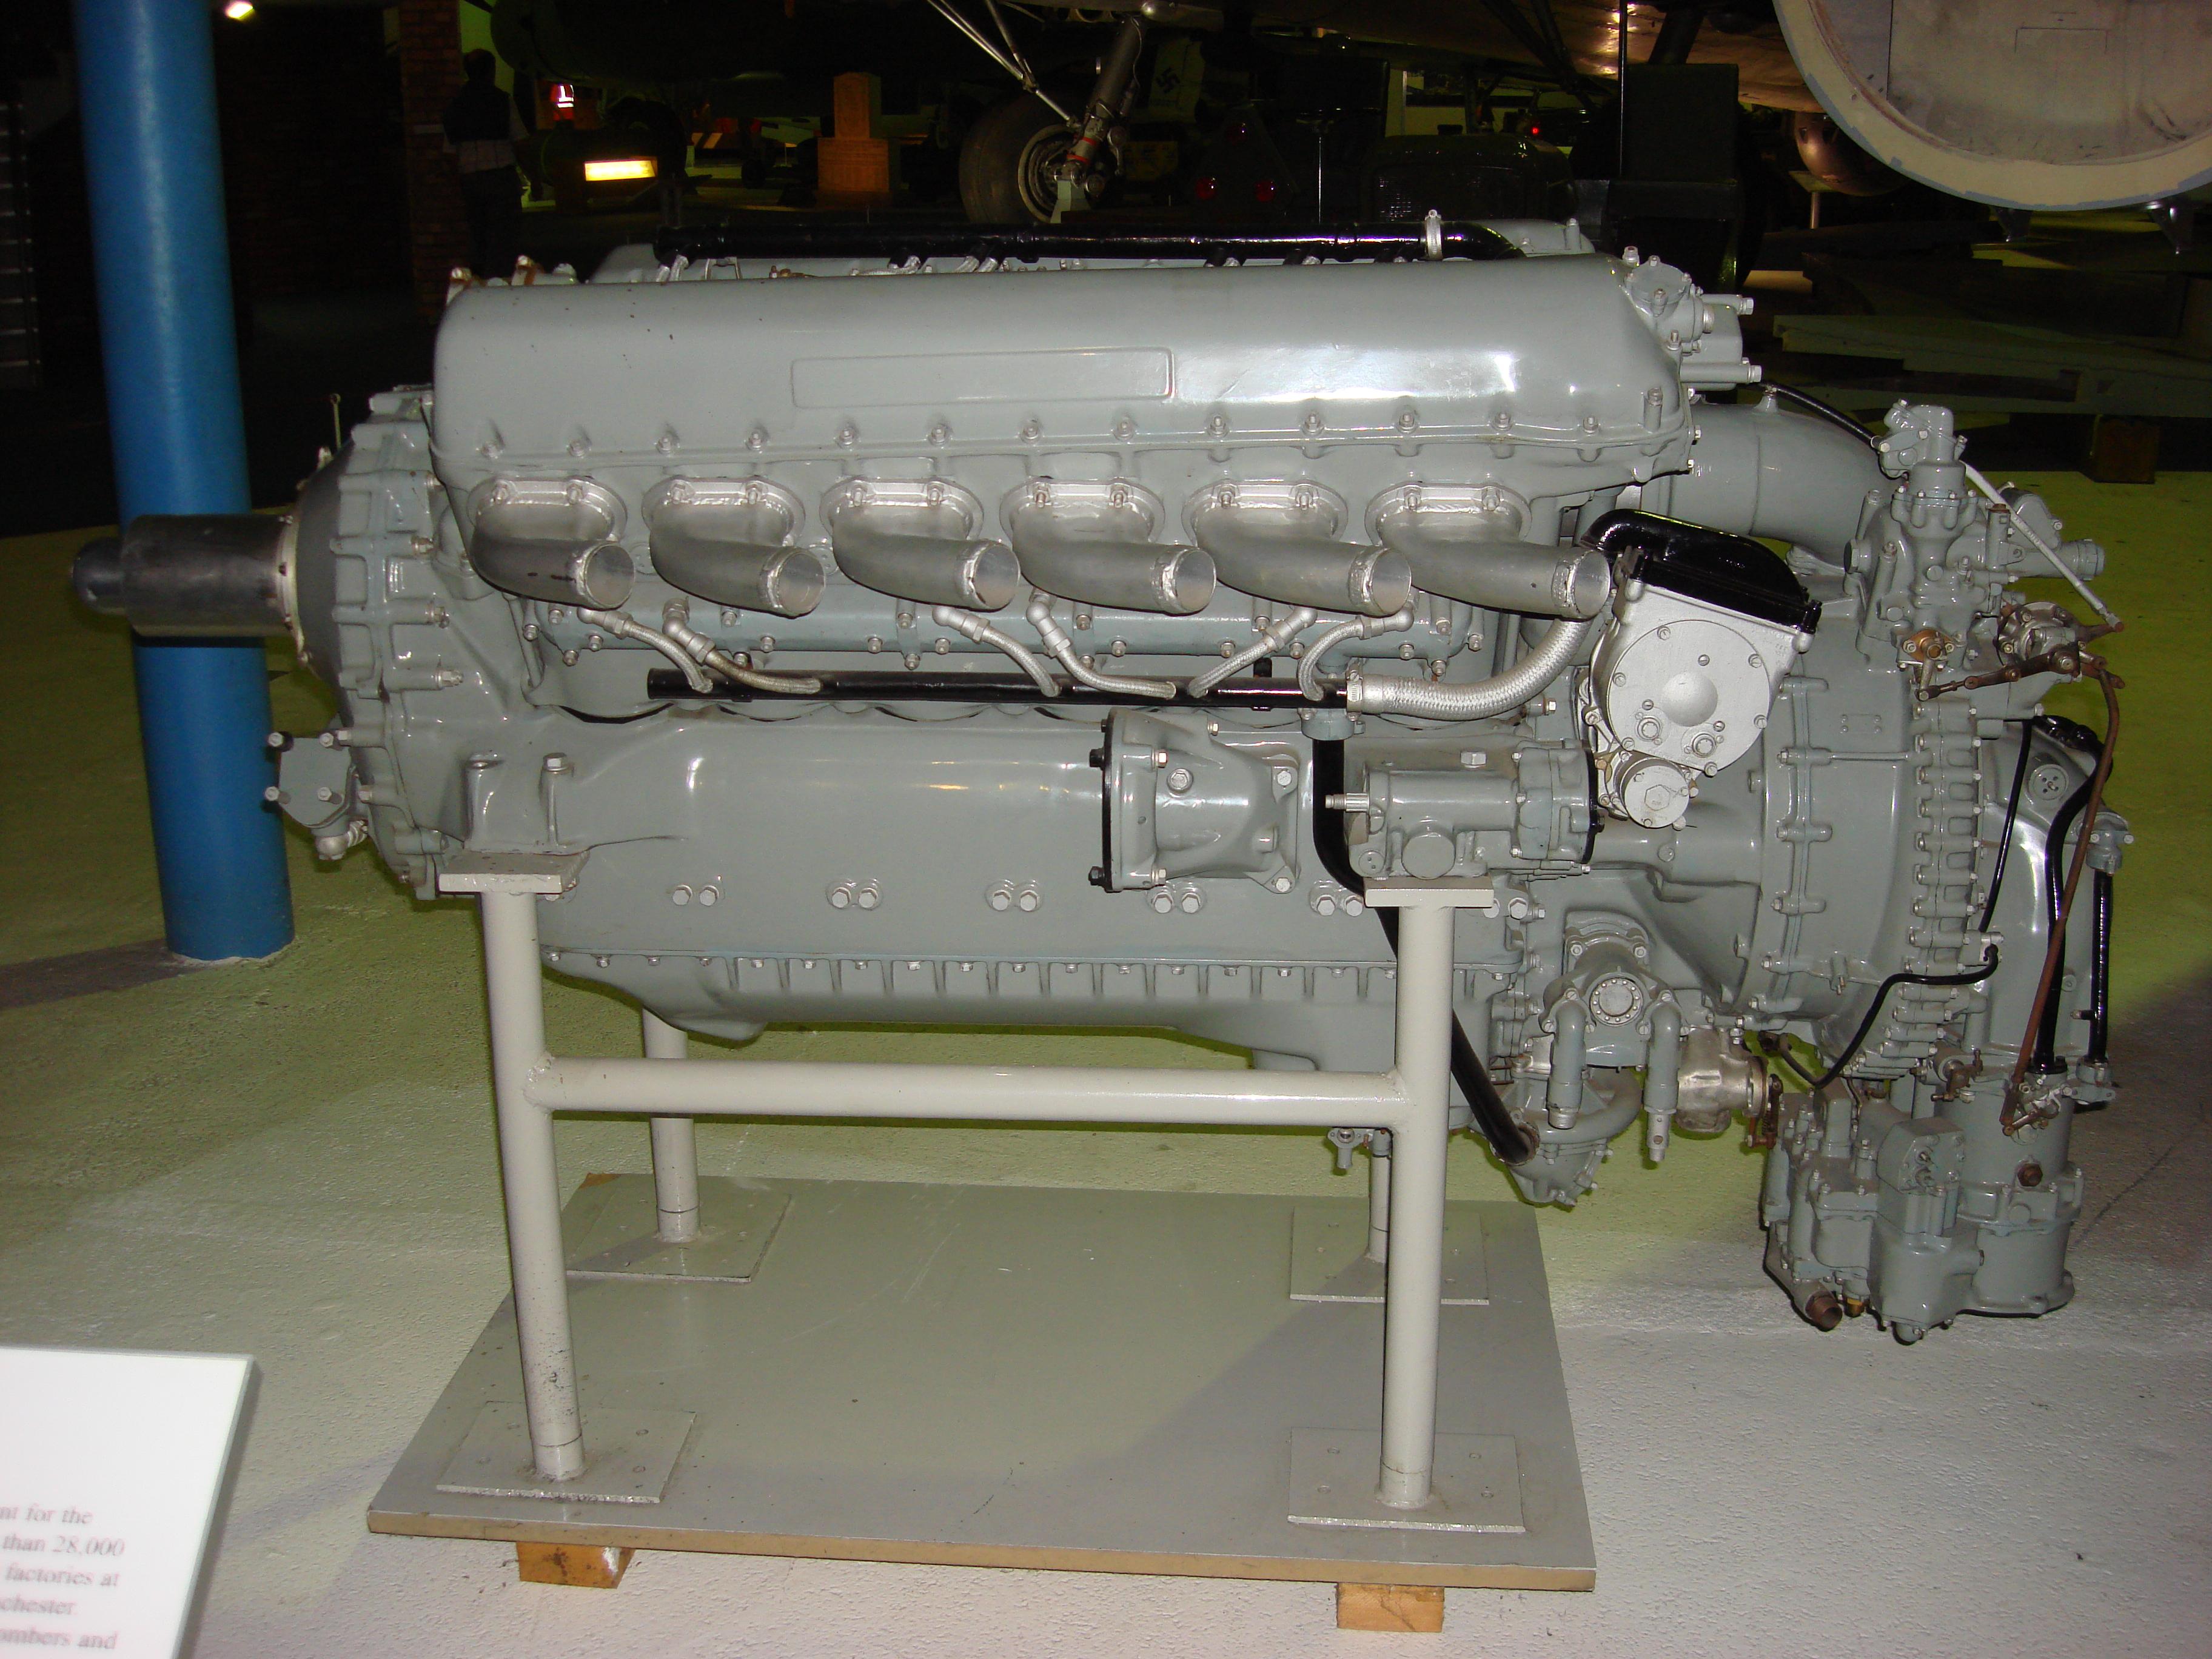 https://i2.wp.com/upload.wikimedia.org/wikipedia/commons/b/b0/Rolls_Royce_Merlin_XX.jpg